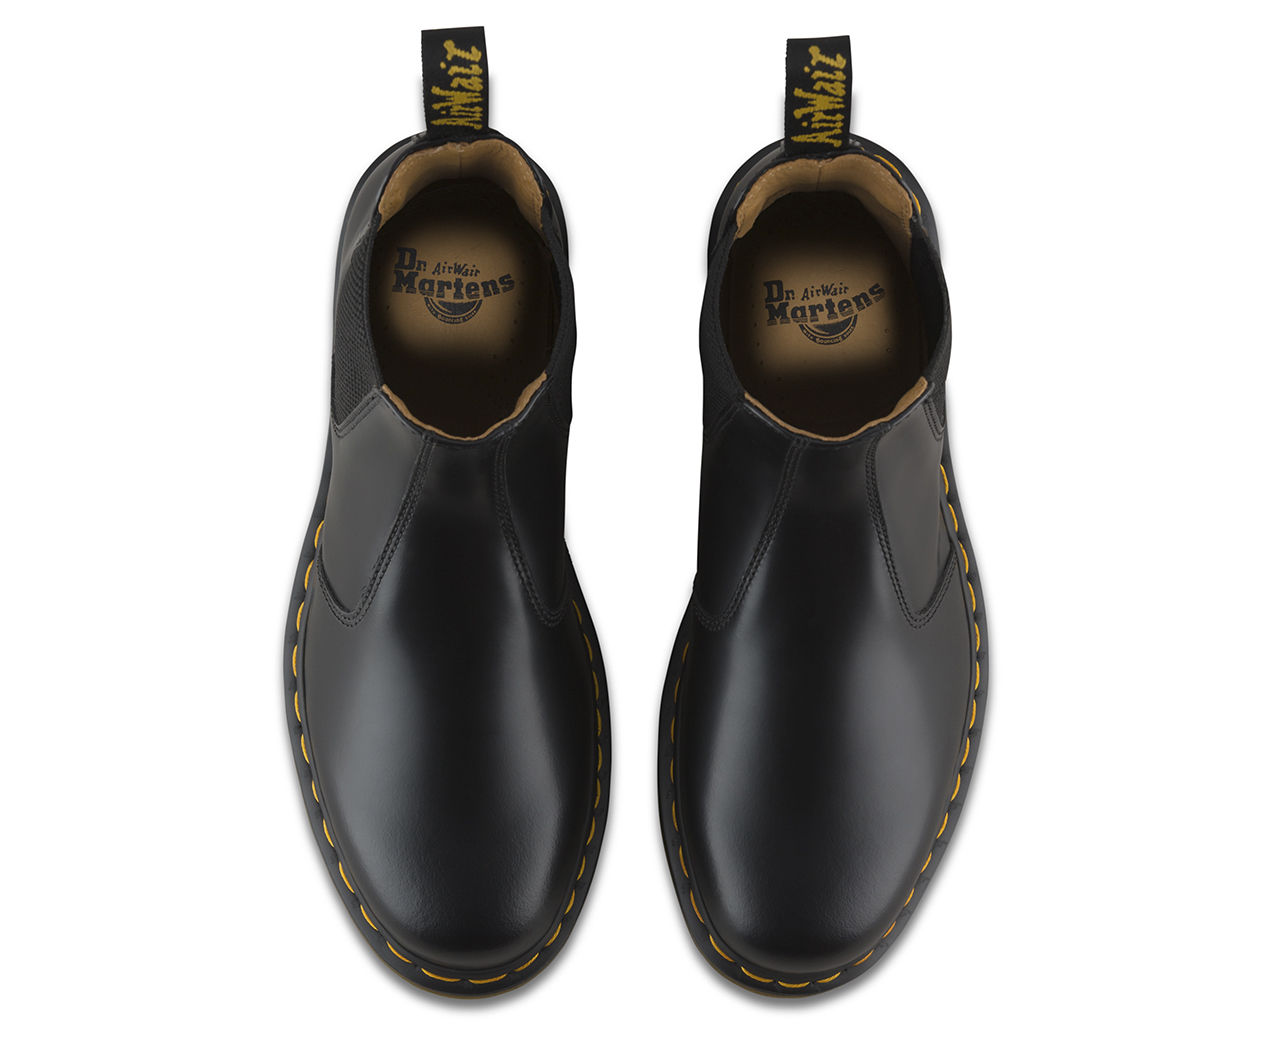 Dr Martens 2976 22227001 Boot Noir Jaune Couture Chelsea Dealer Boot 22227001 taille 3-13UK ff2581